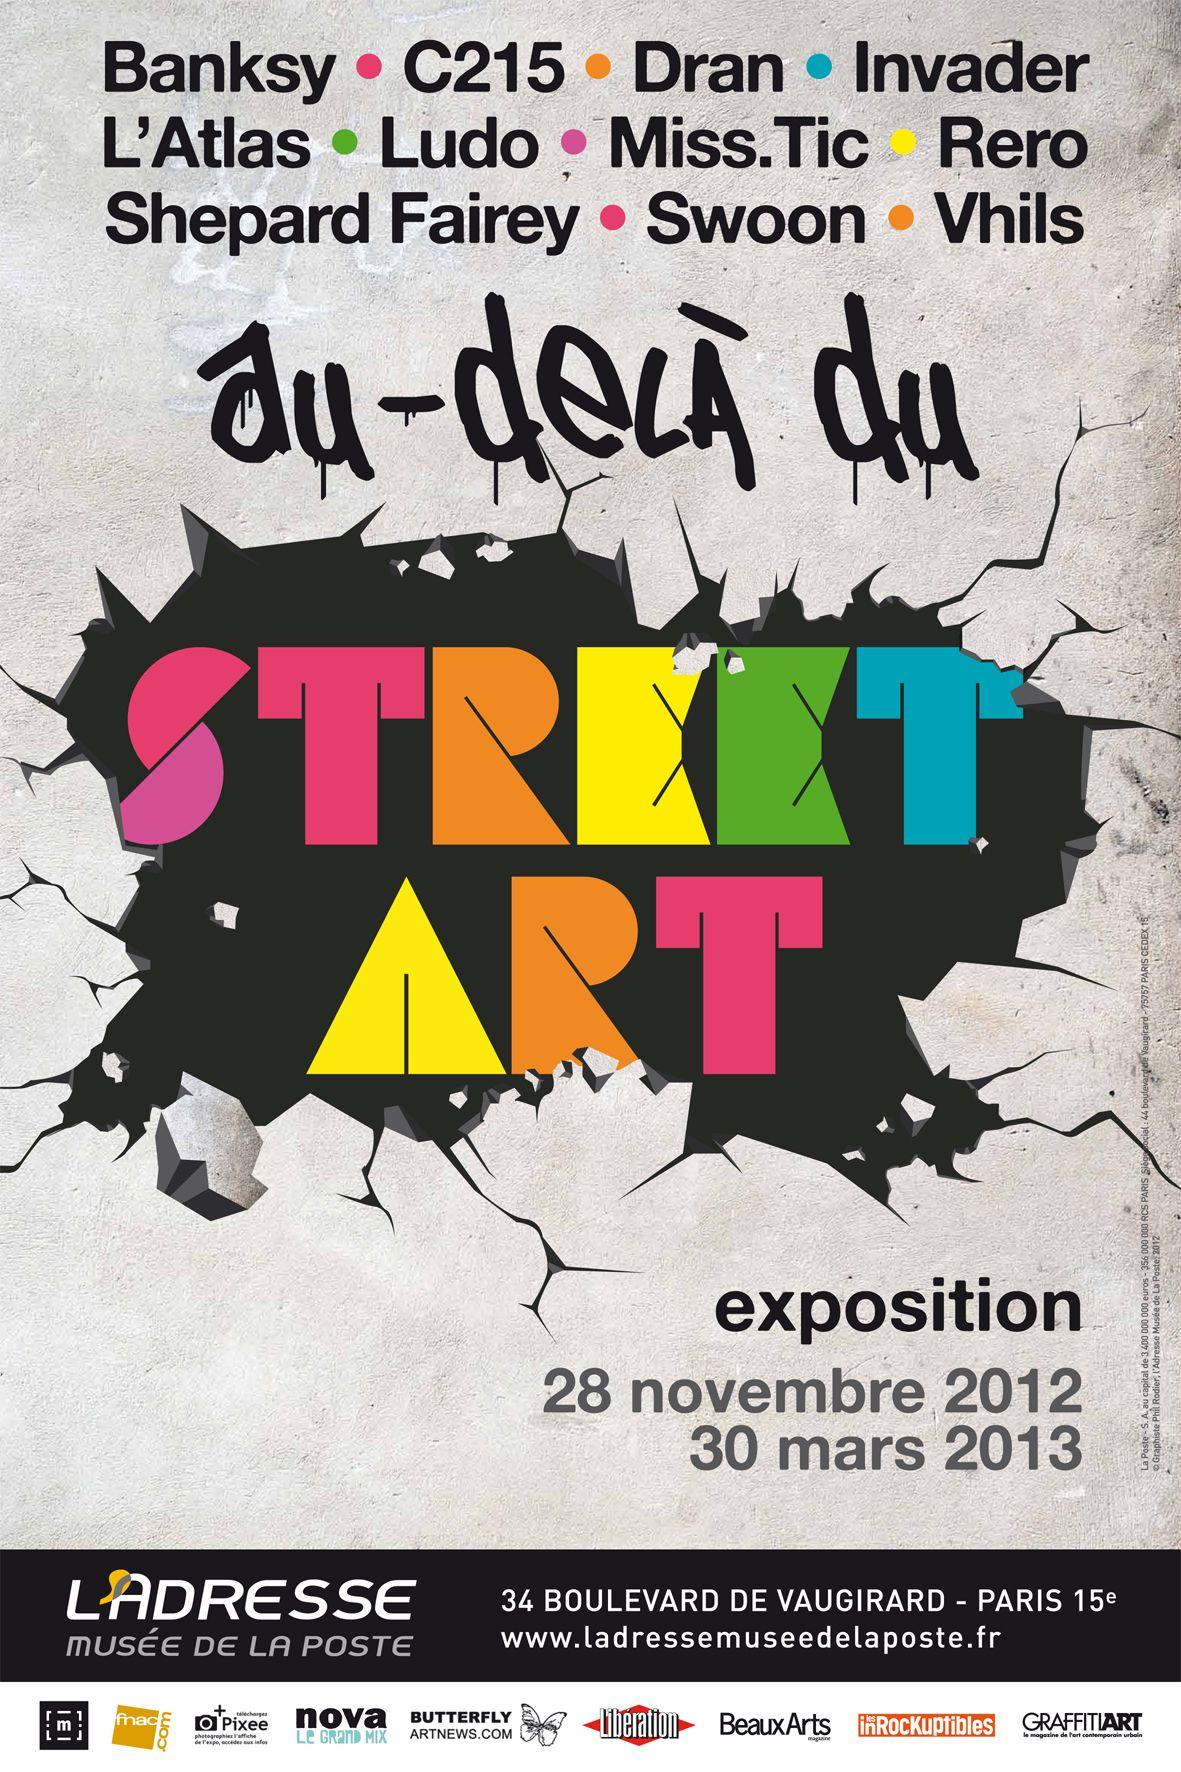 affiche de l'exposition | illustration | pinterest | street art and